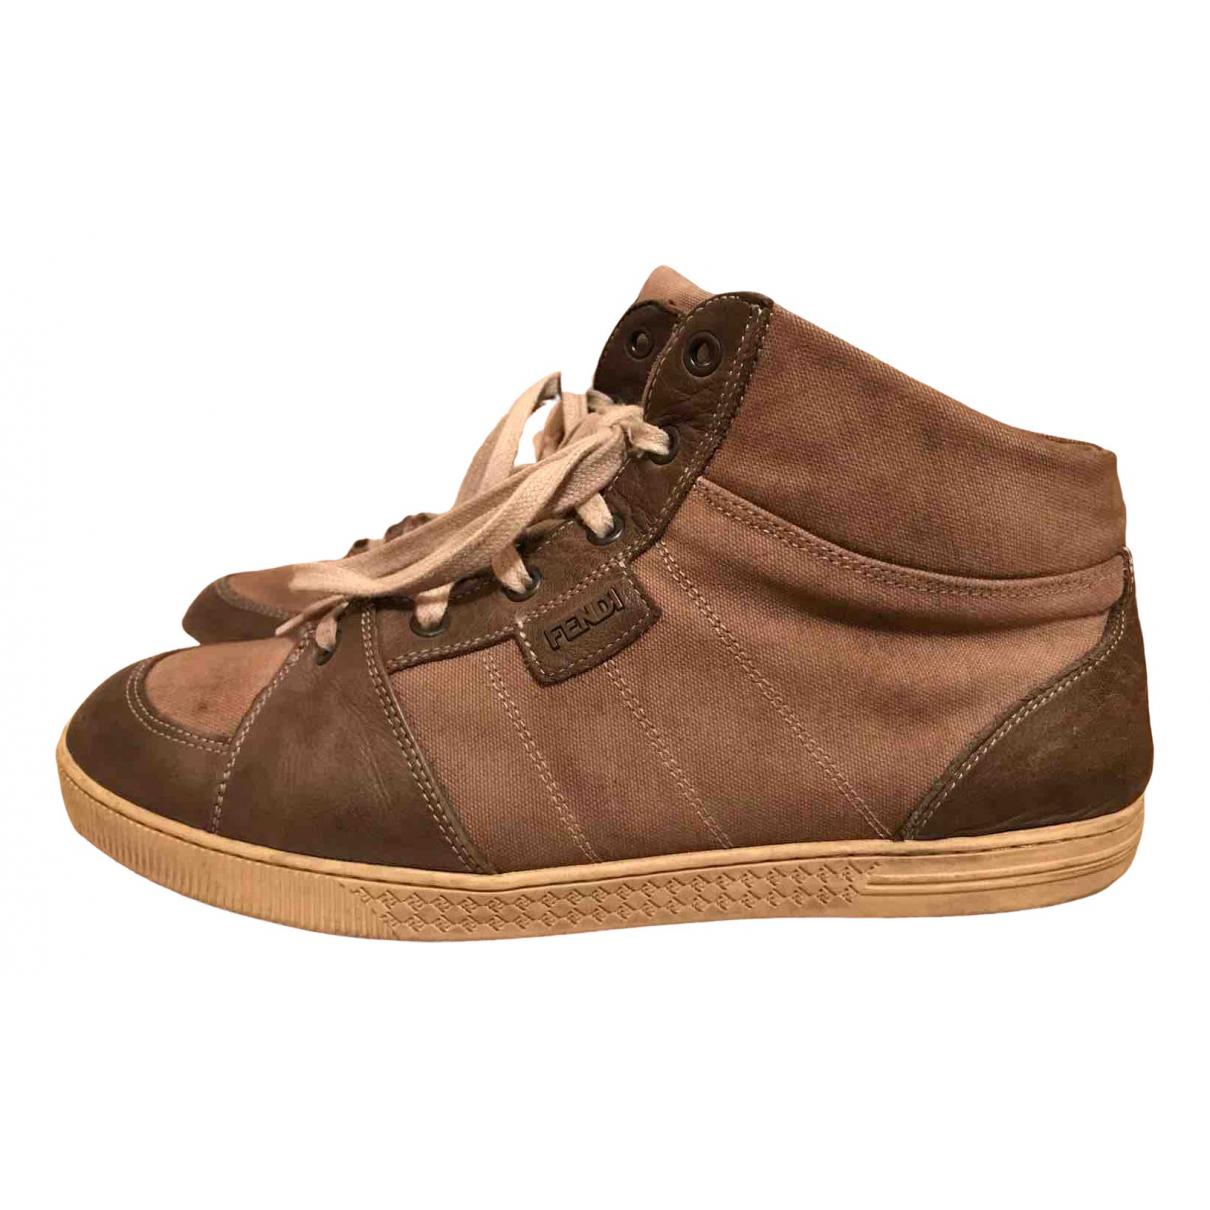 Fendi \N Brown Leather Trainers for Women 40.5 EU